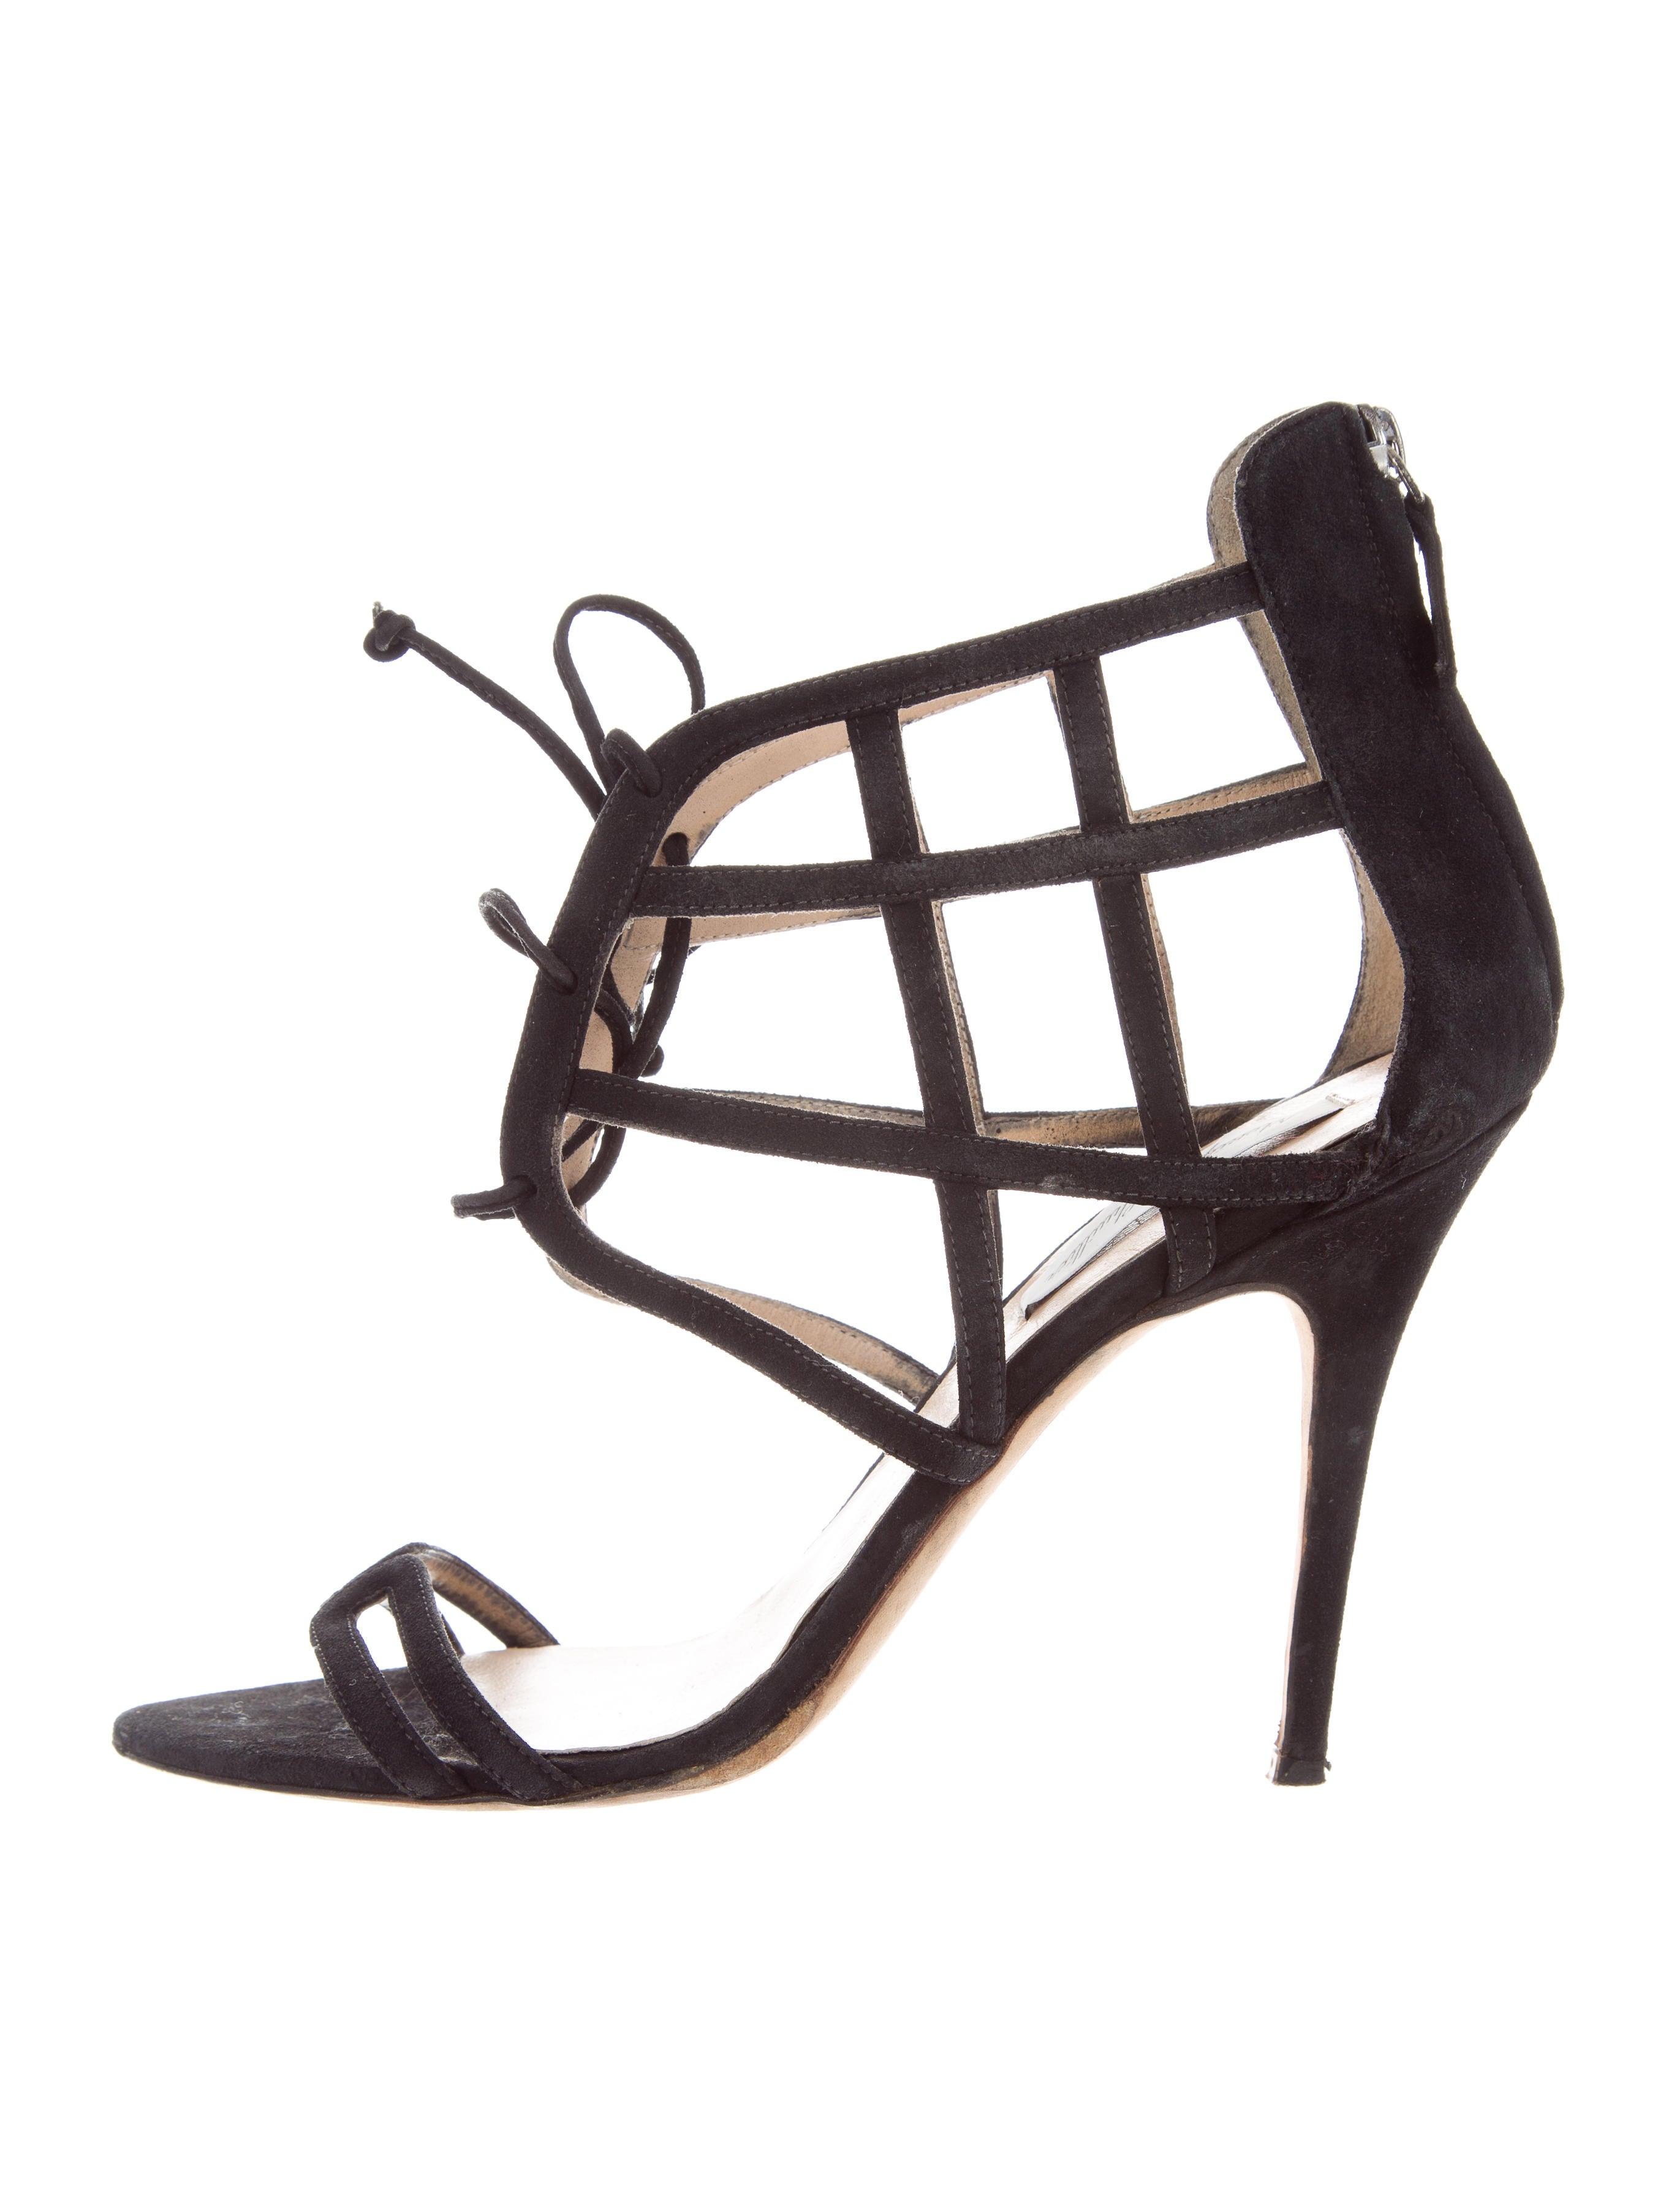 genuine for sale shop for cheap price Monique Lhuillier Suede Cage Sandals pick a best sale online finishline ASoR5FO6Pj